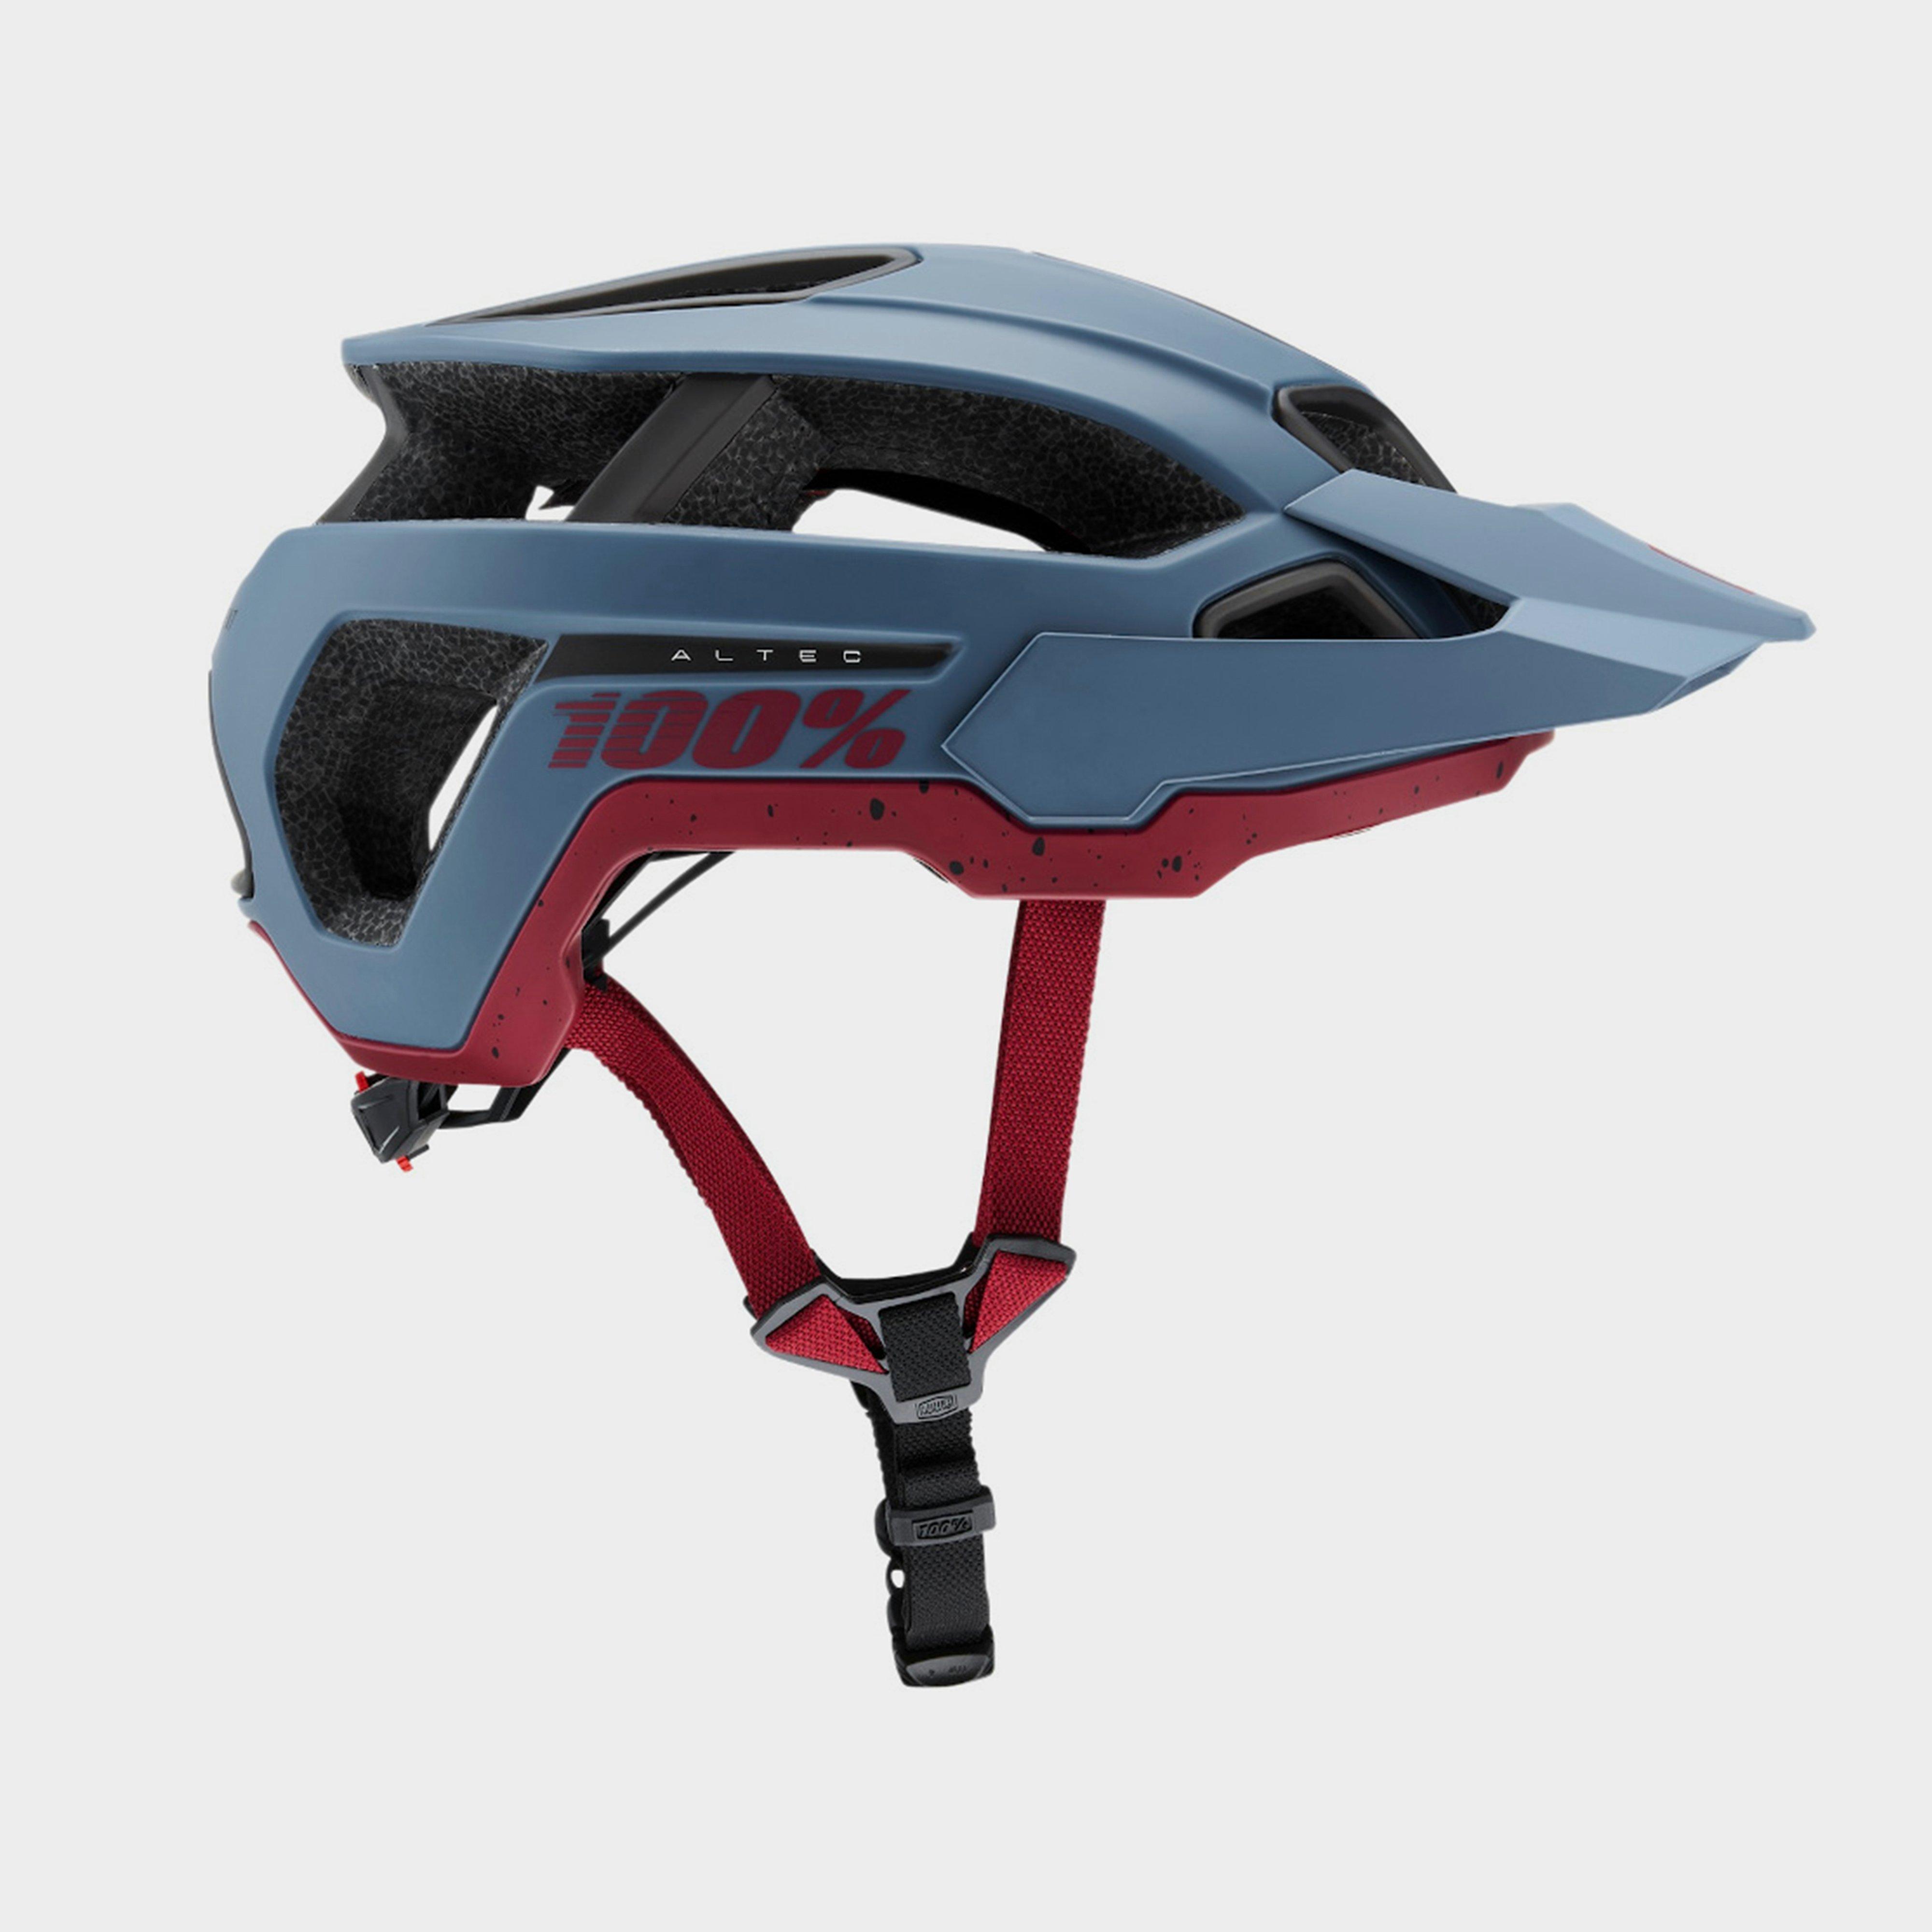 2.0 Universal Neon Gore-tex Helmet Cover - Black  Black